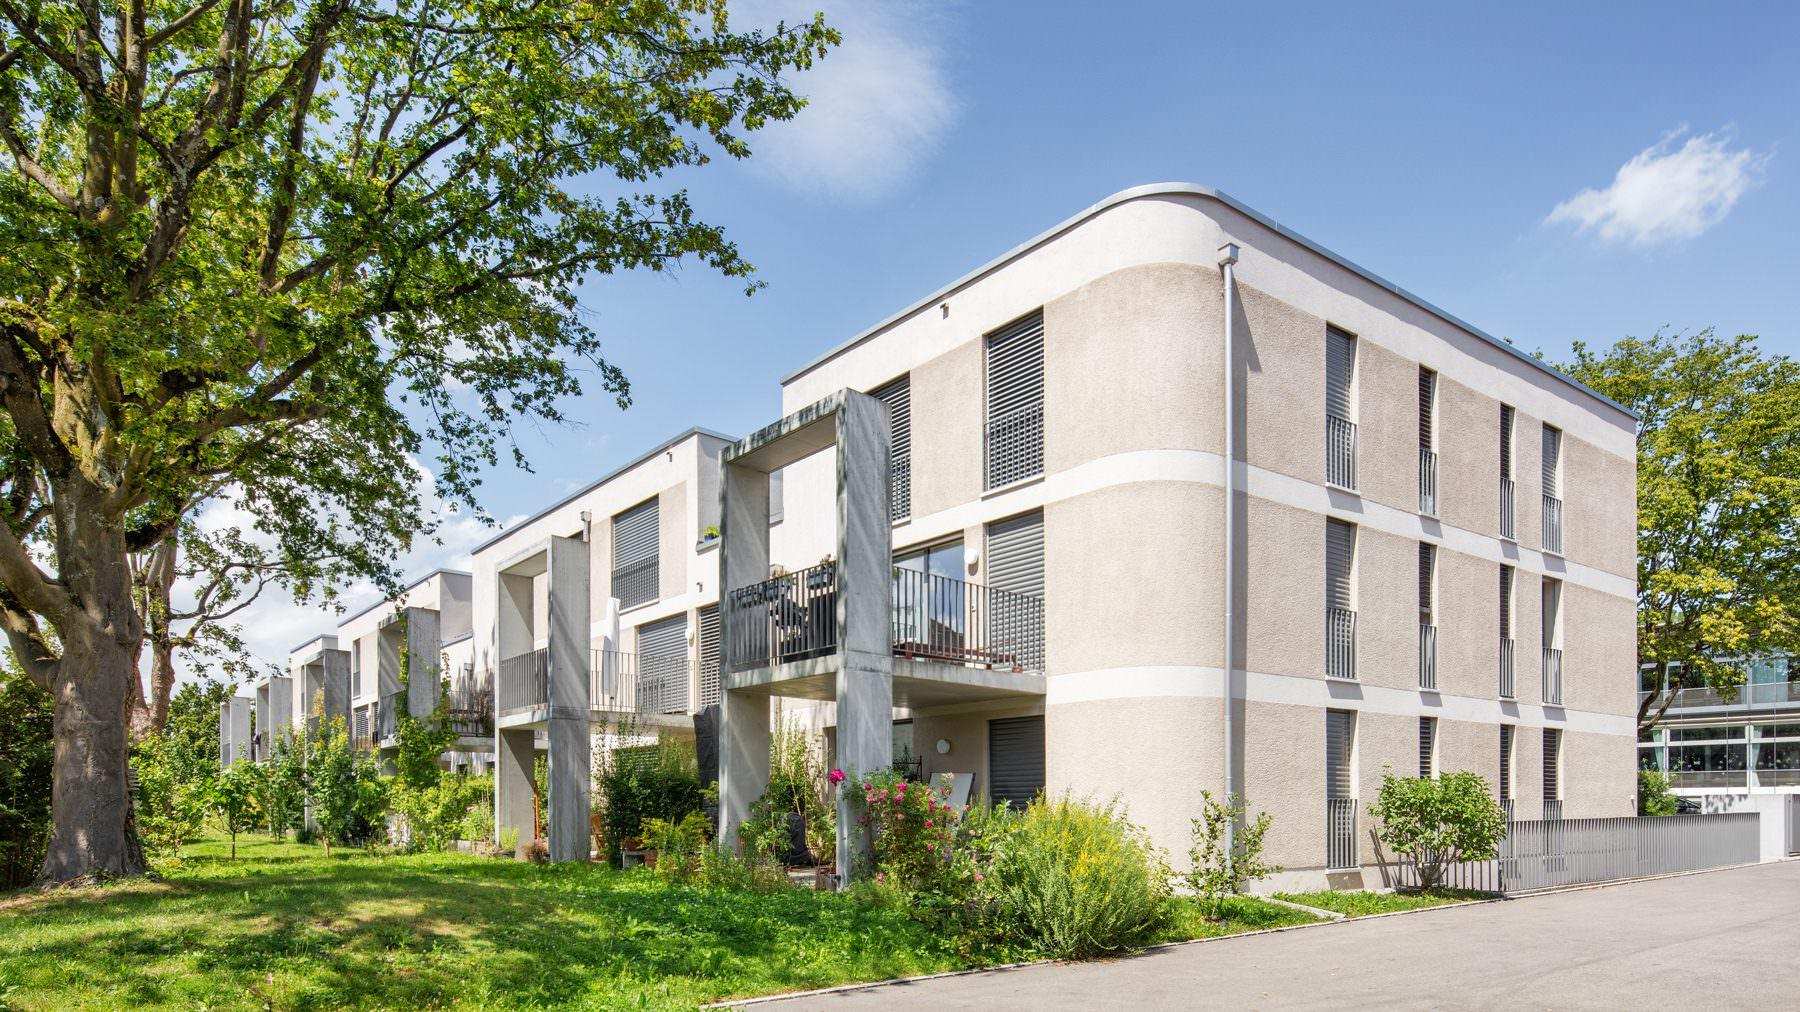 Immobilien Dokumentation BVK Winterthur Wiesenstrasse © by Gerry